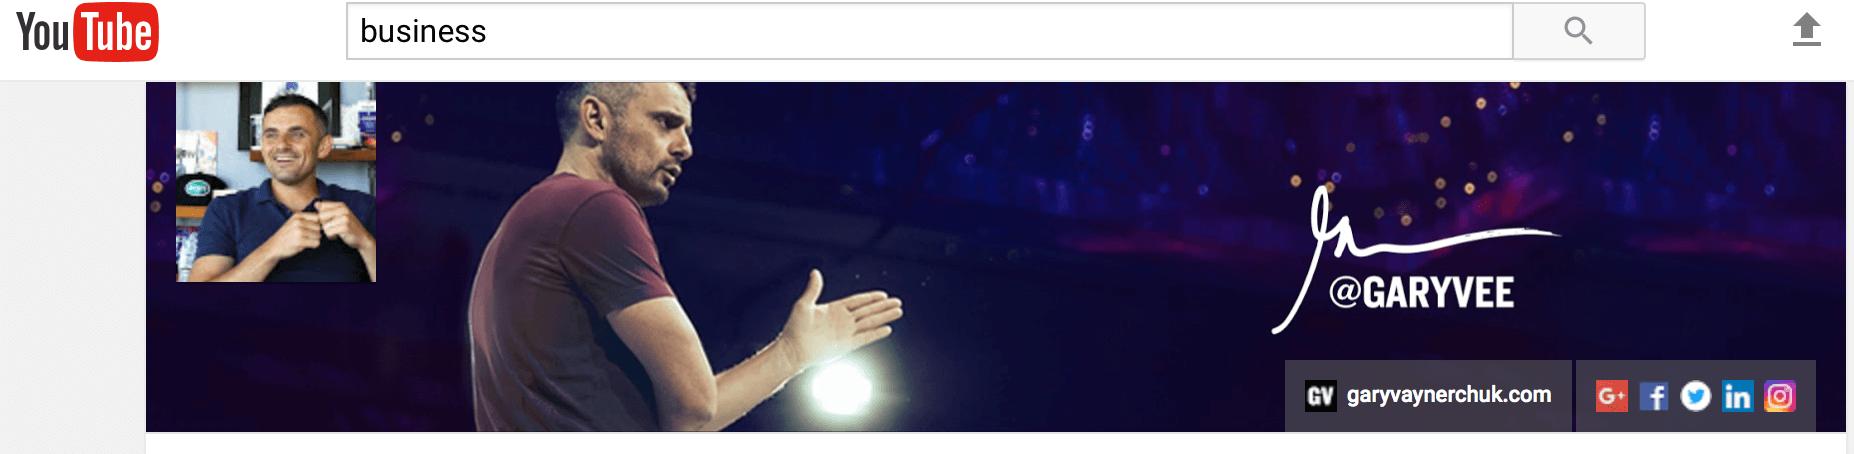 Gary Vaynerchuk YouTube channel art ideas